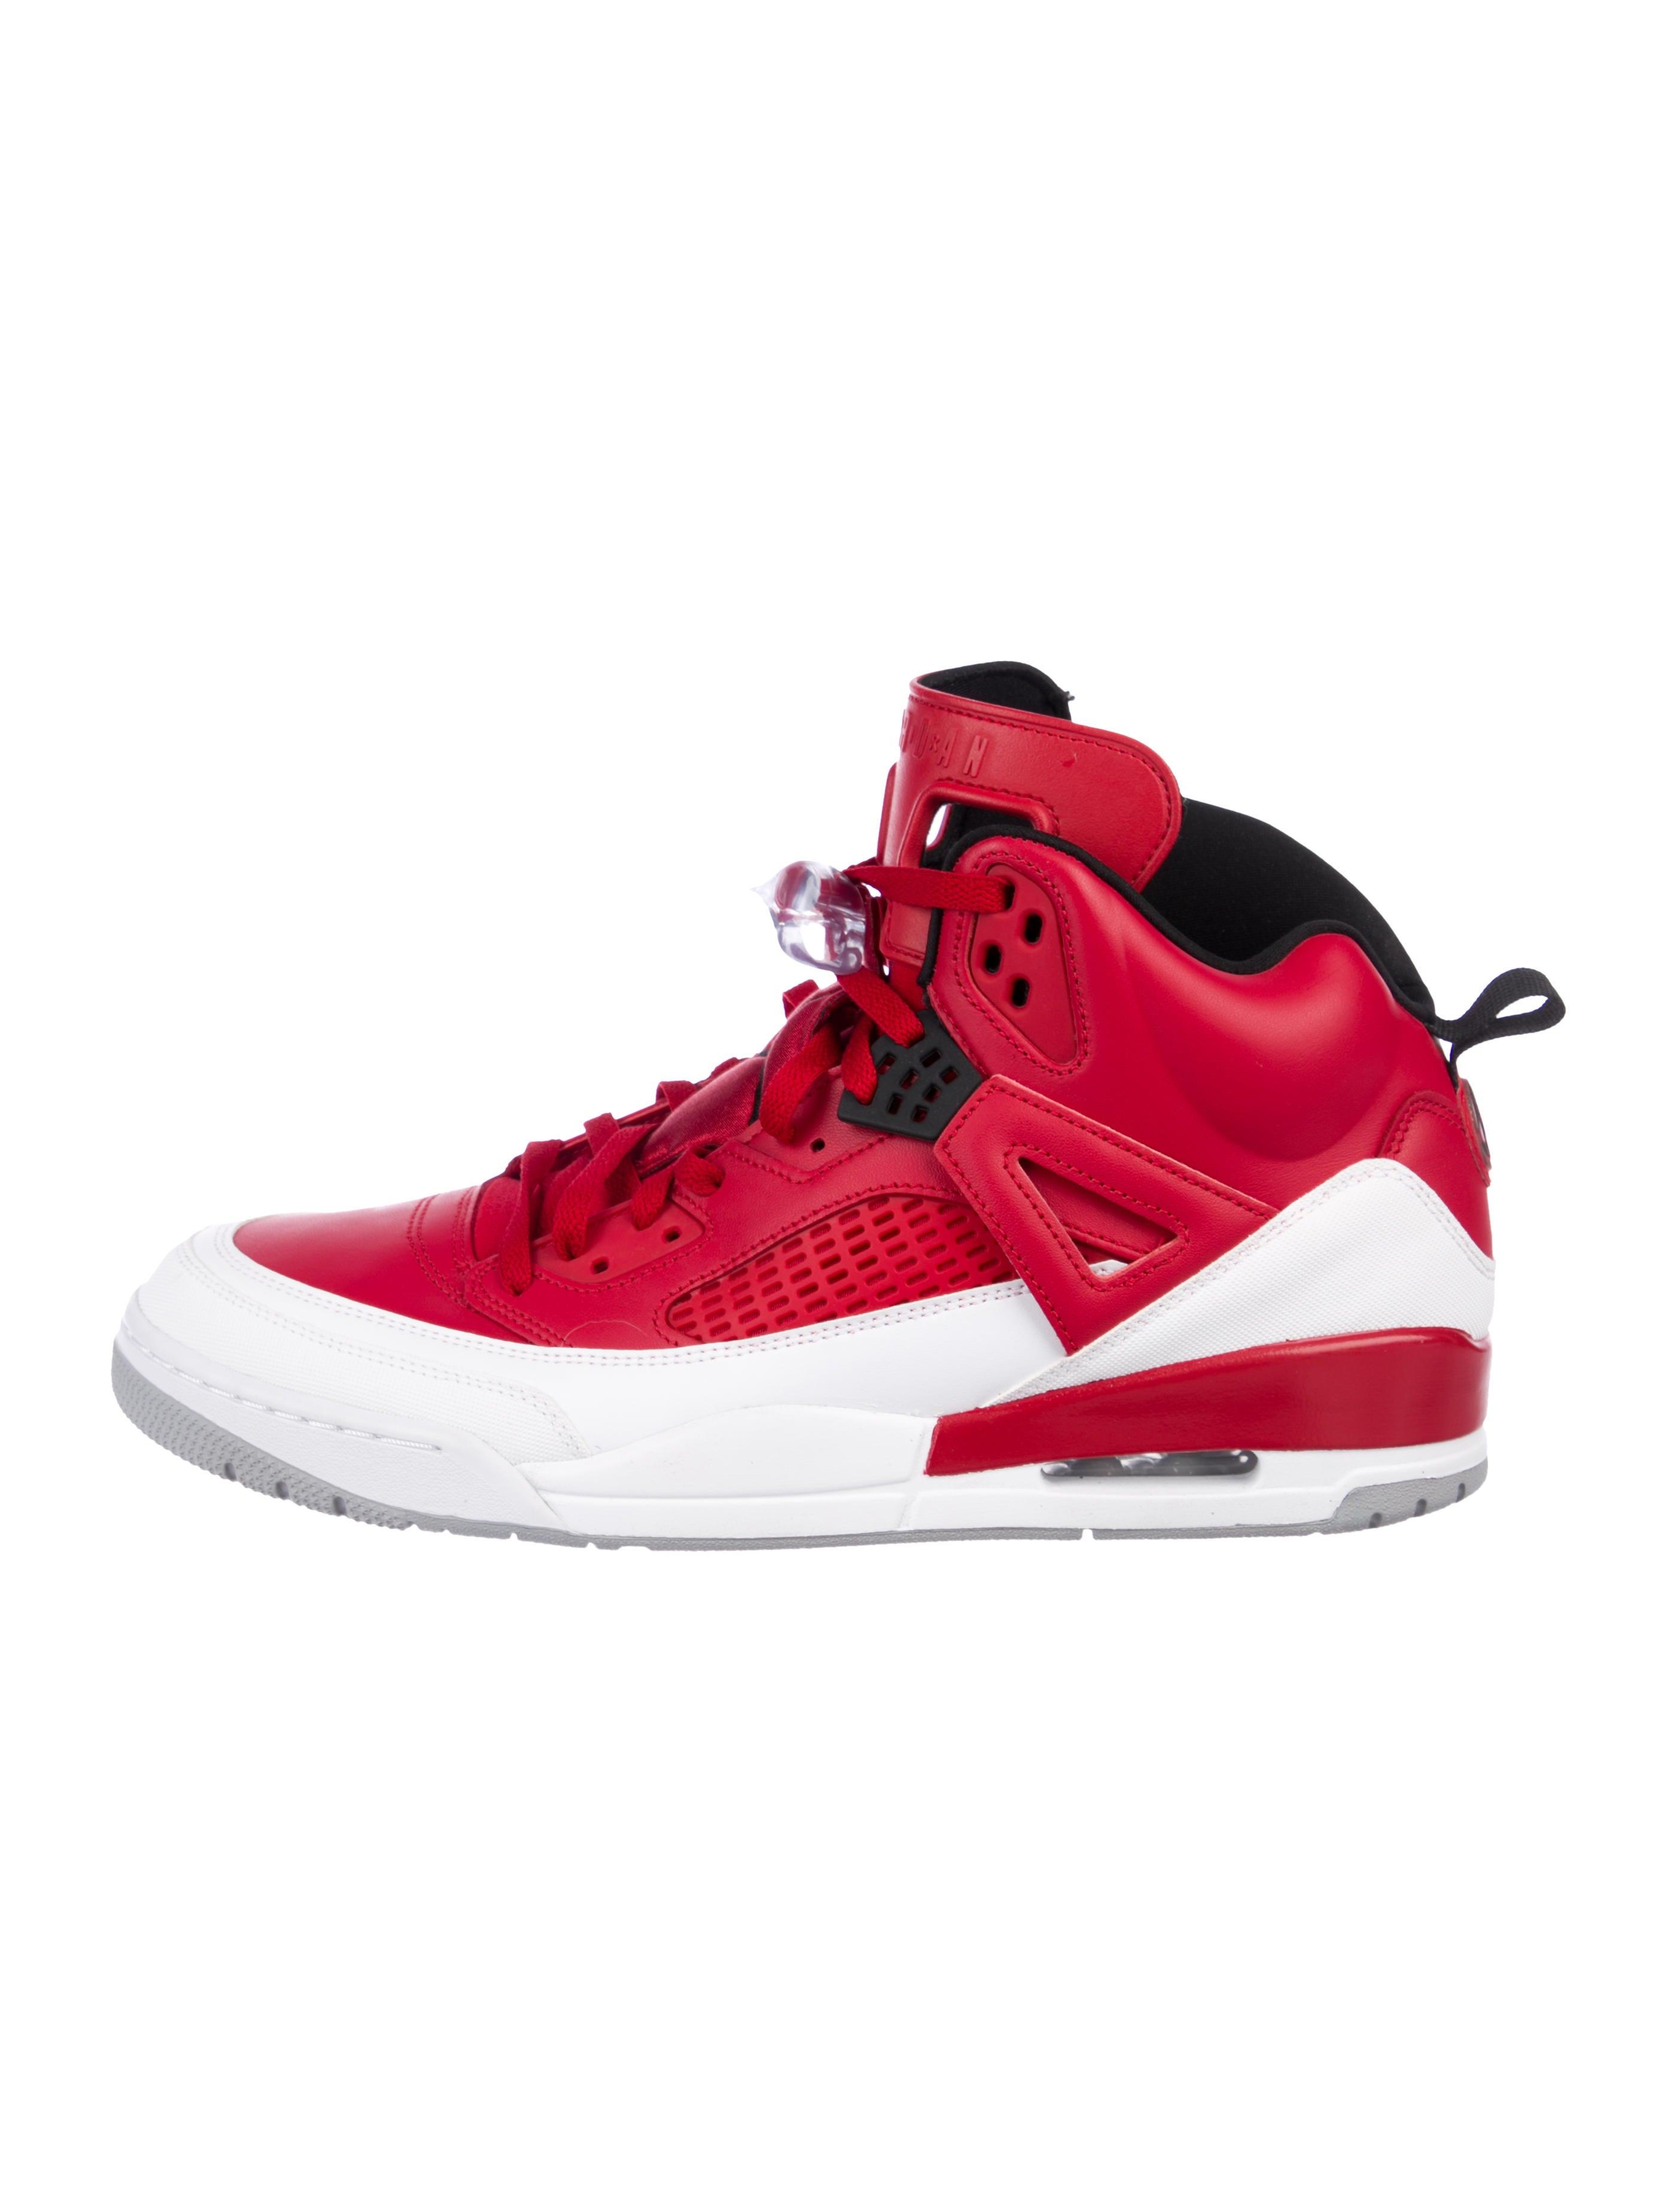 various colors fc145 b6a72 Nike Air Jordan Spizike High-Top Sneakers w  Tags - Shoes ...